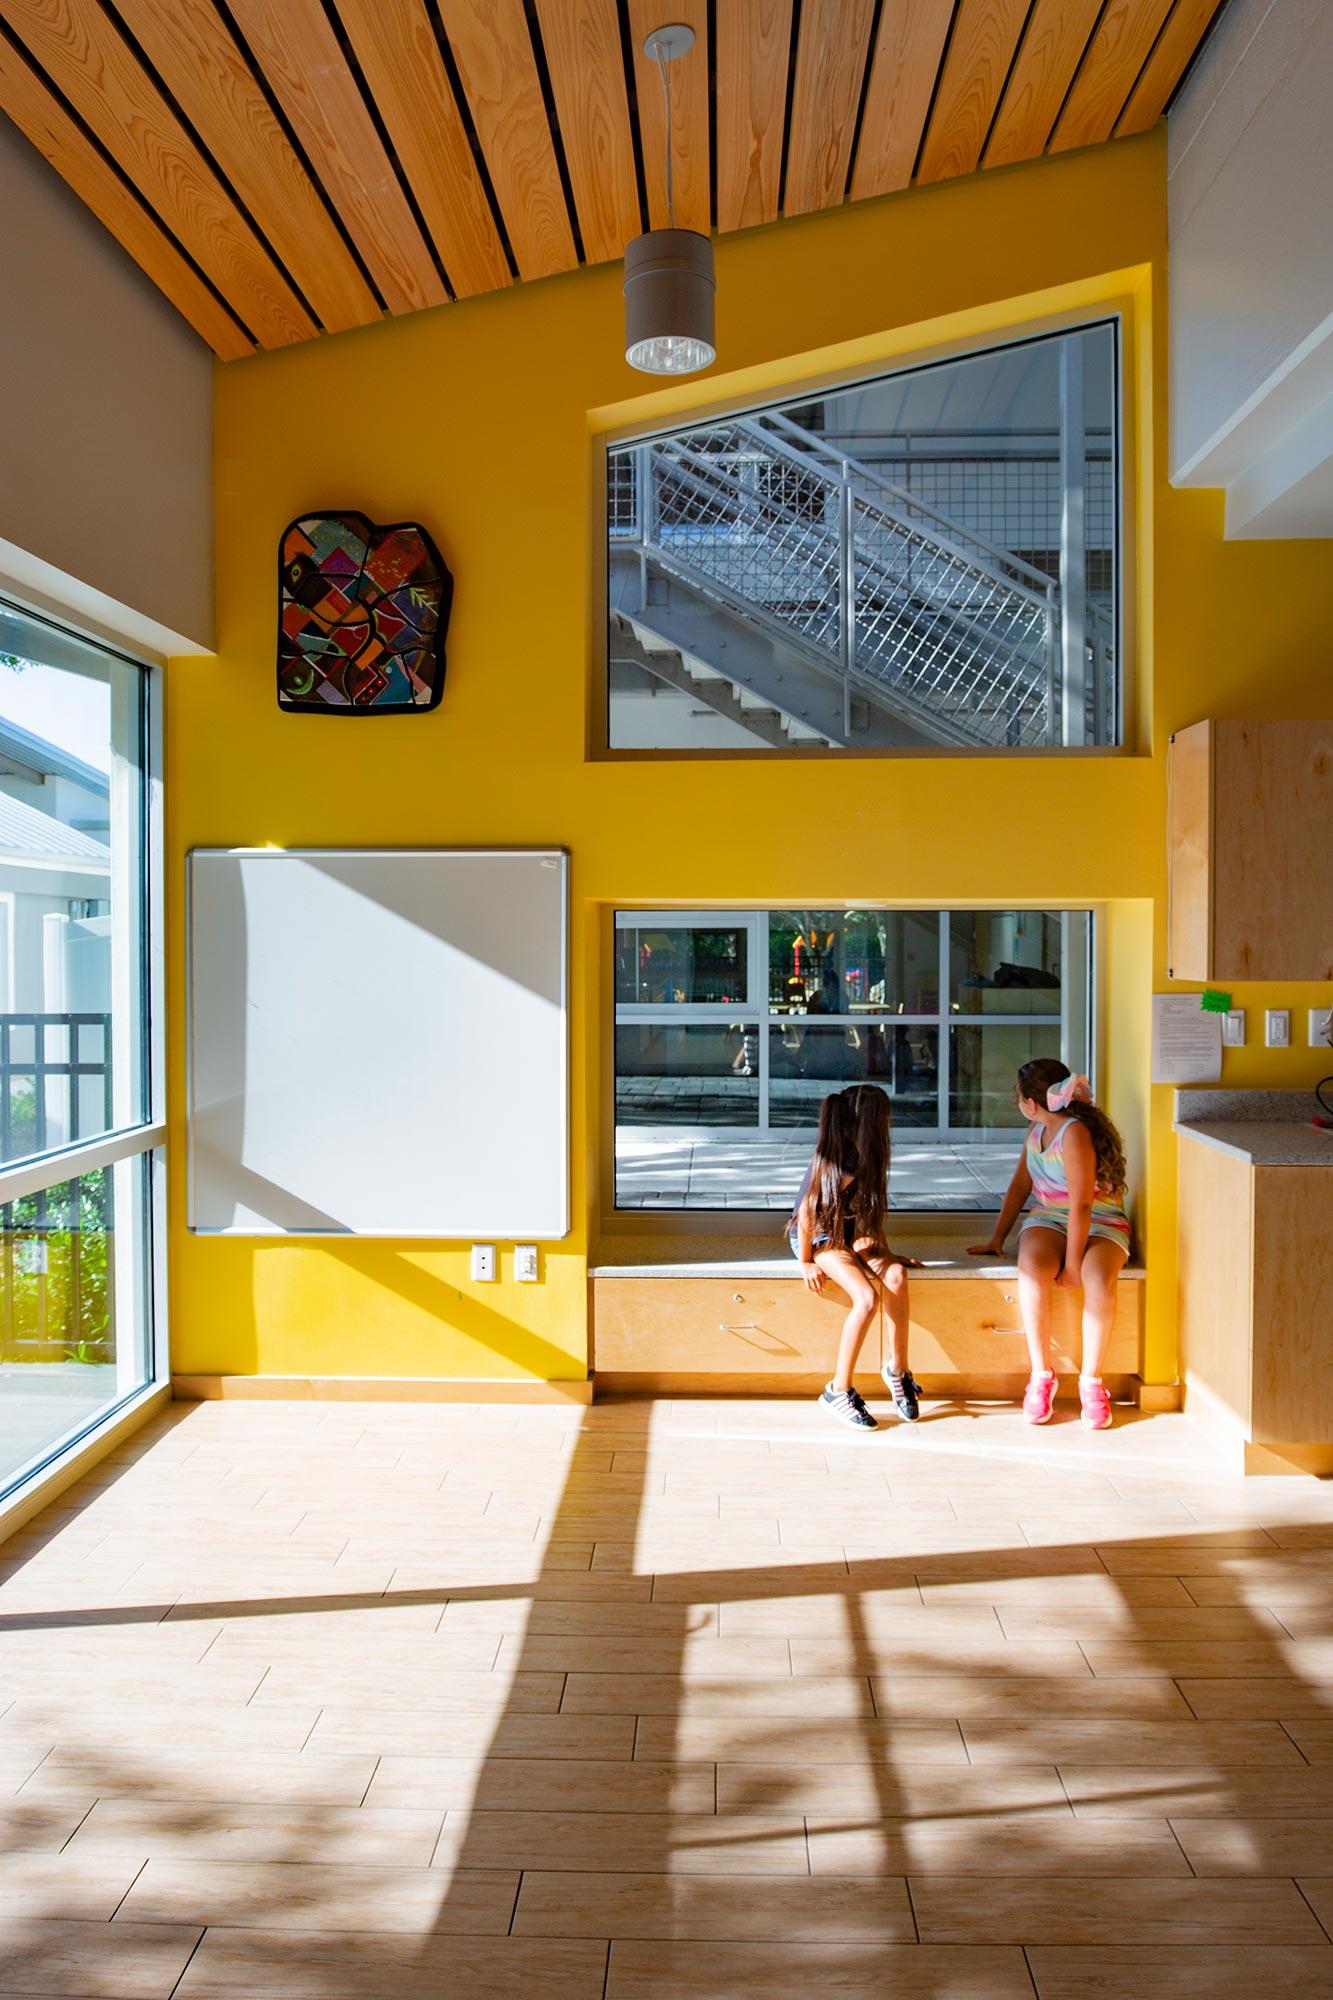 Built-in window seat in classroom.